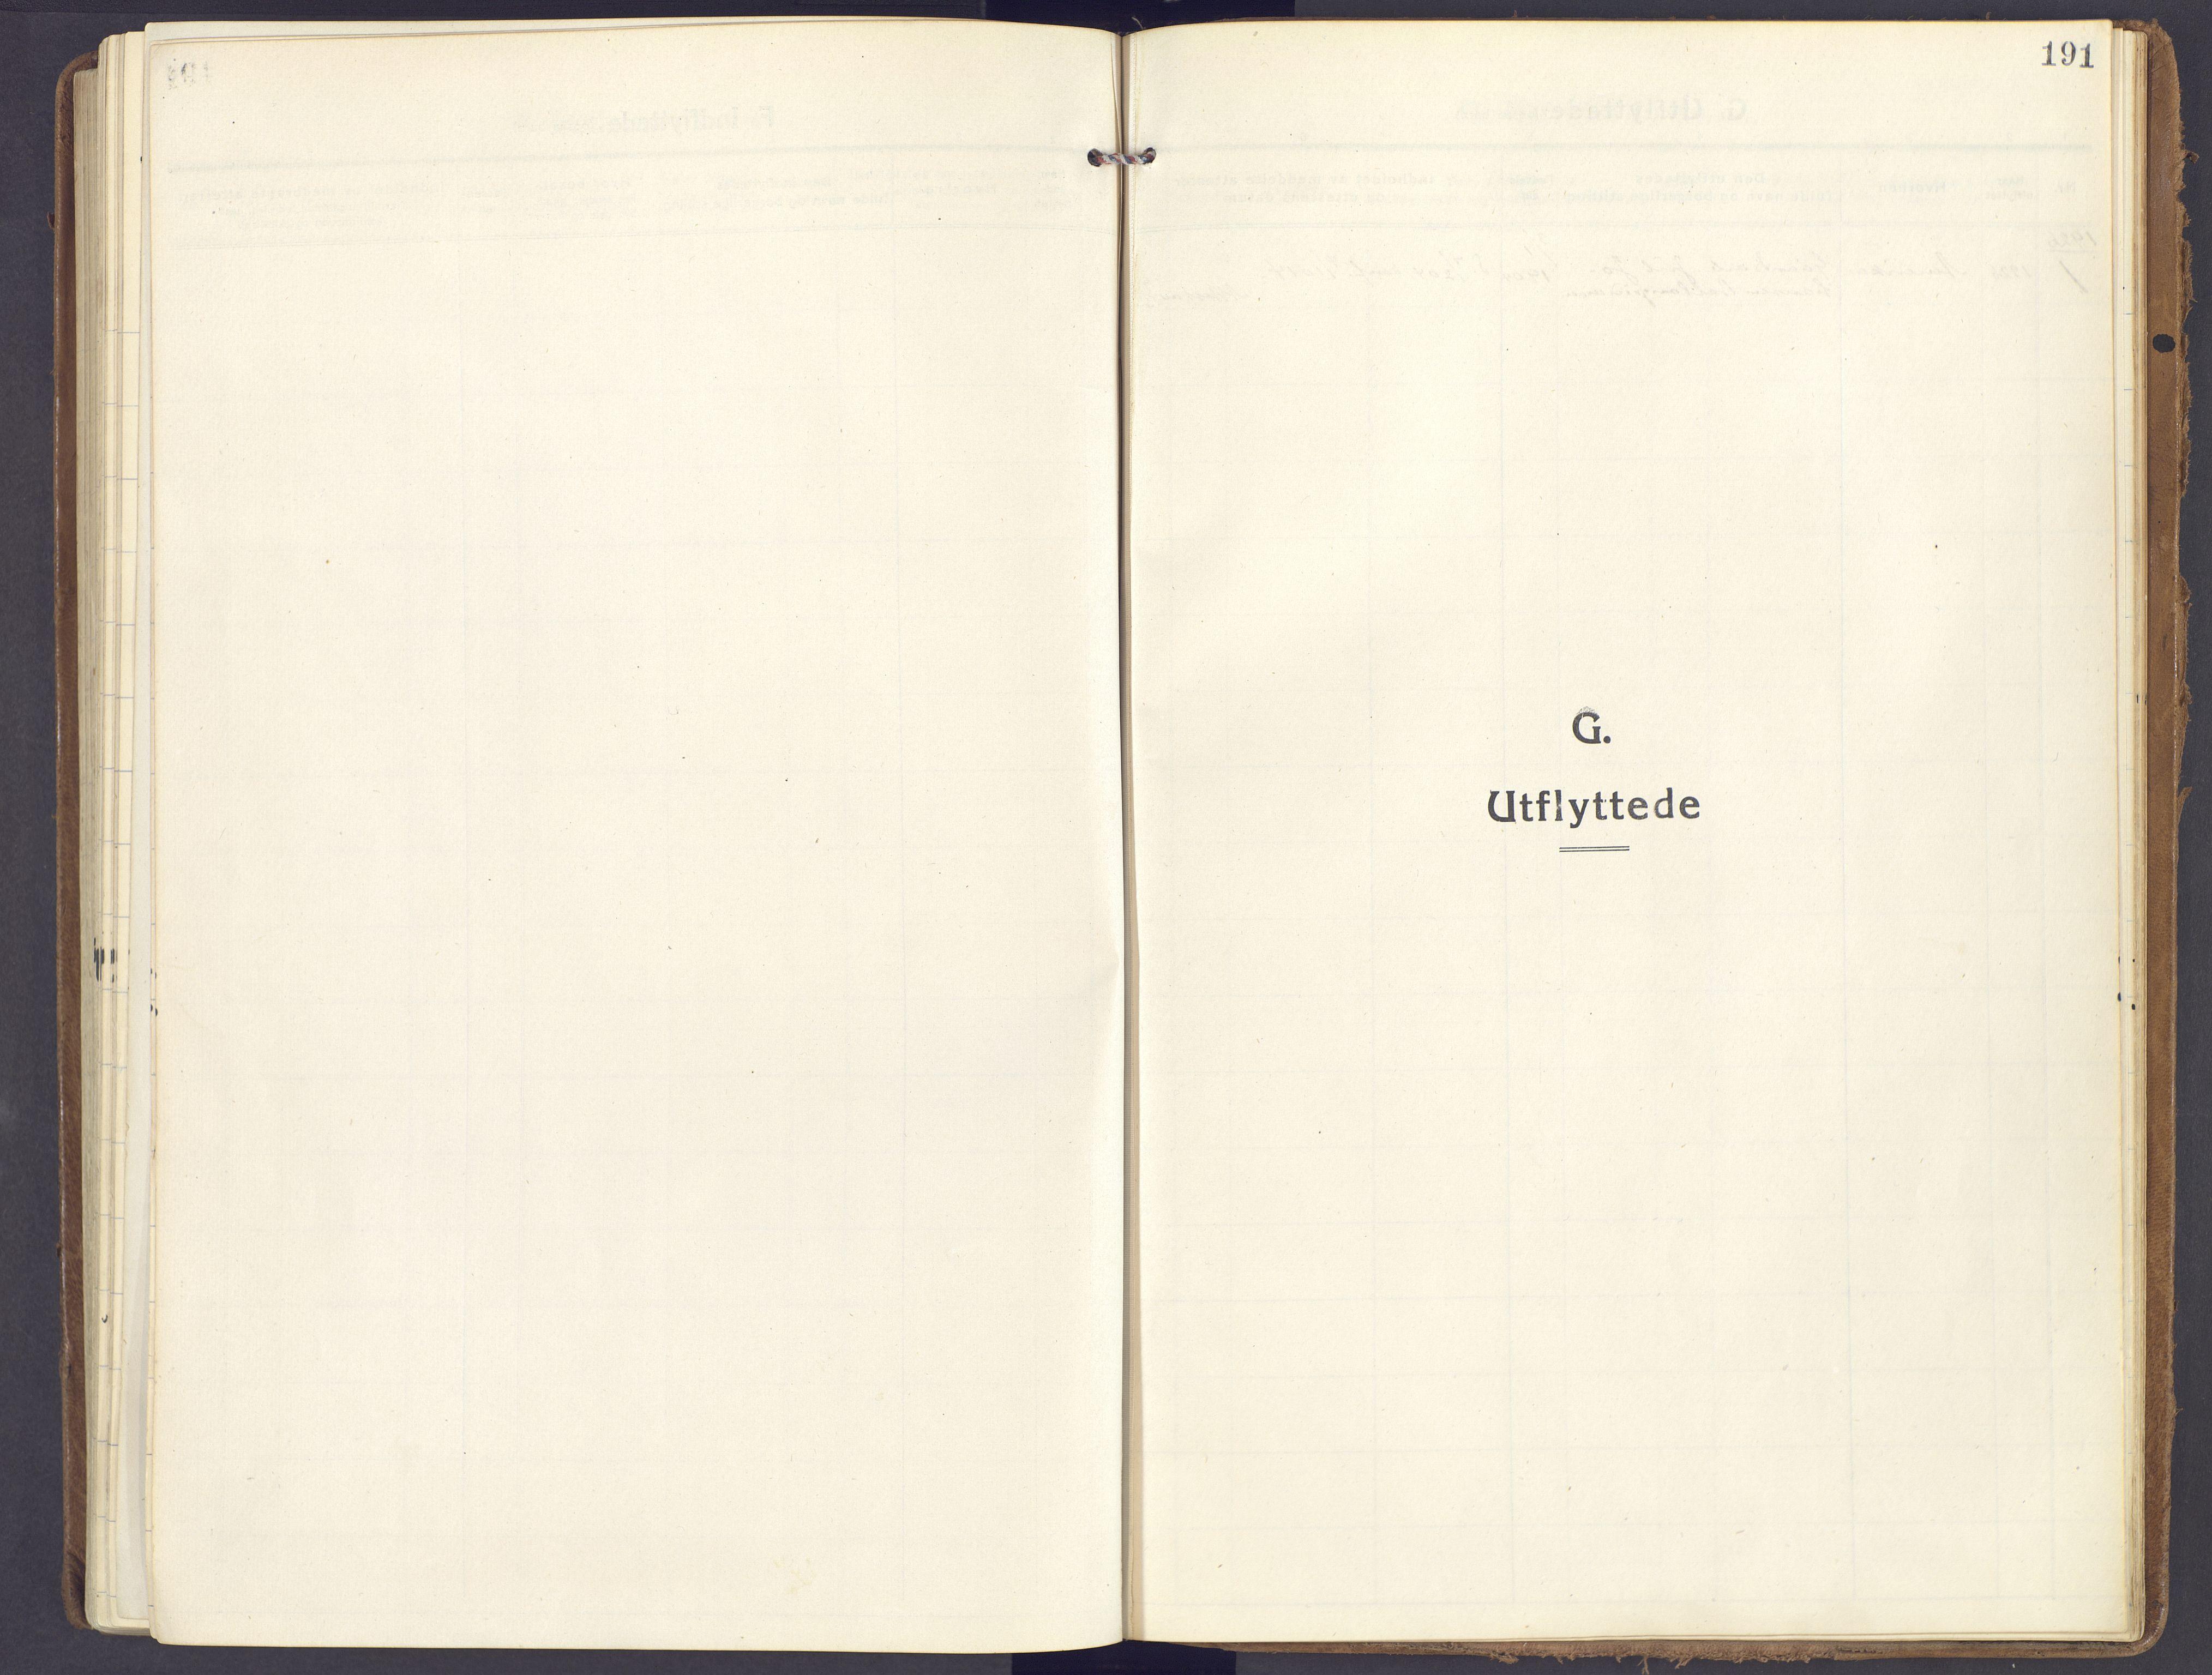 SAH, Lunner prestekontor, H/Ha/Haa/L0002: Ministerialbok nr. 2, 1922-1931, s. 191